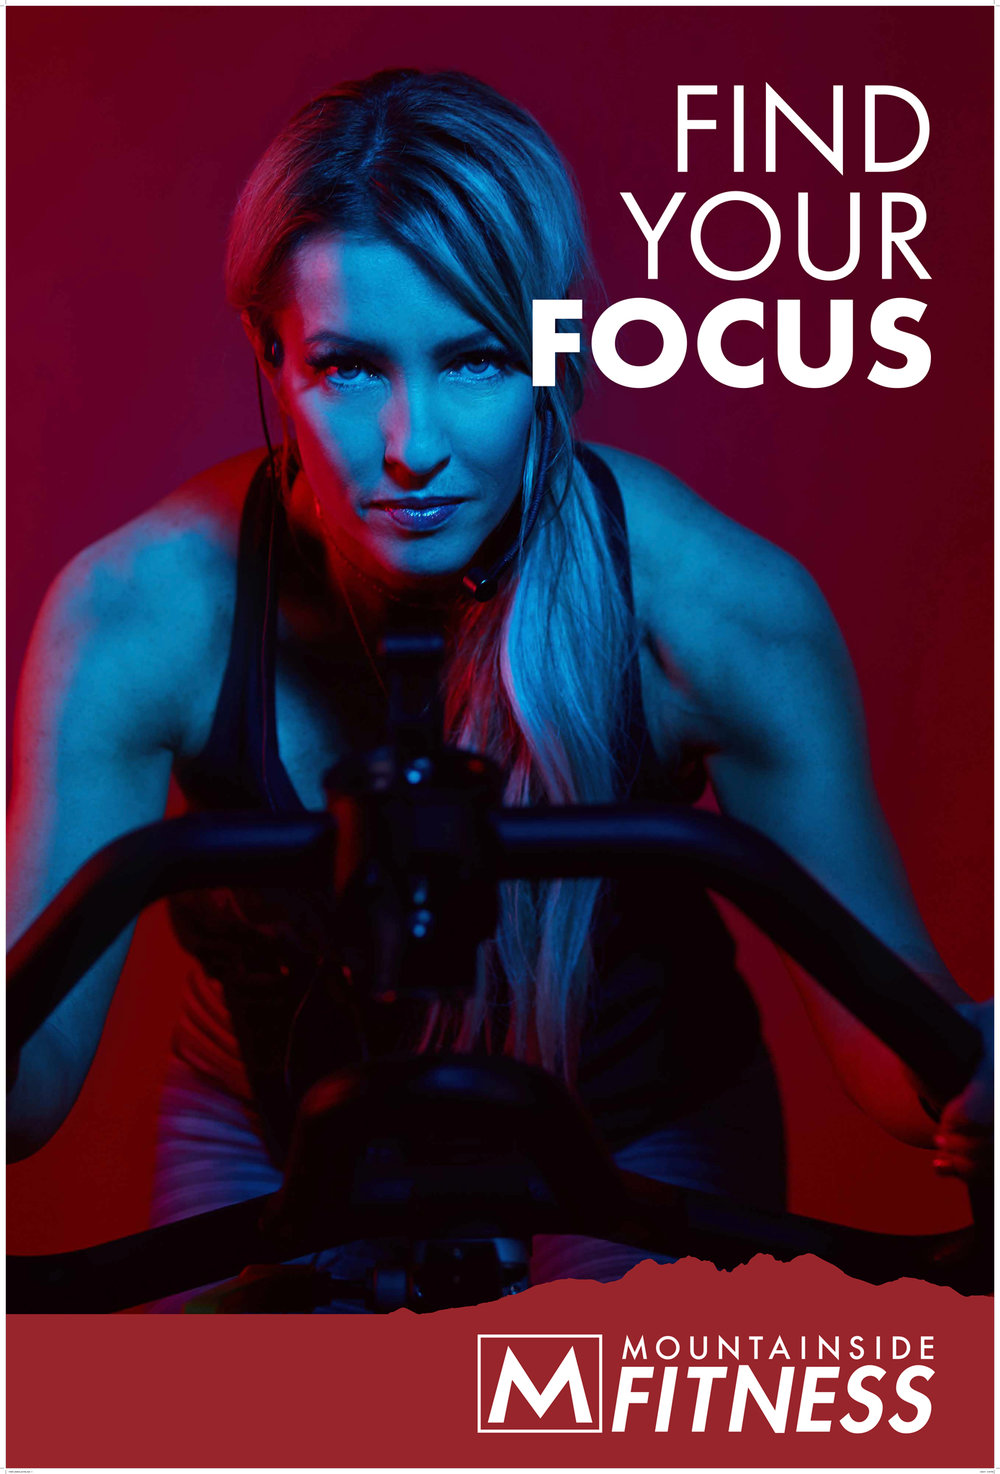 Mountainside Fitness Advertising Photography Tear Sheet 1.jpg